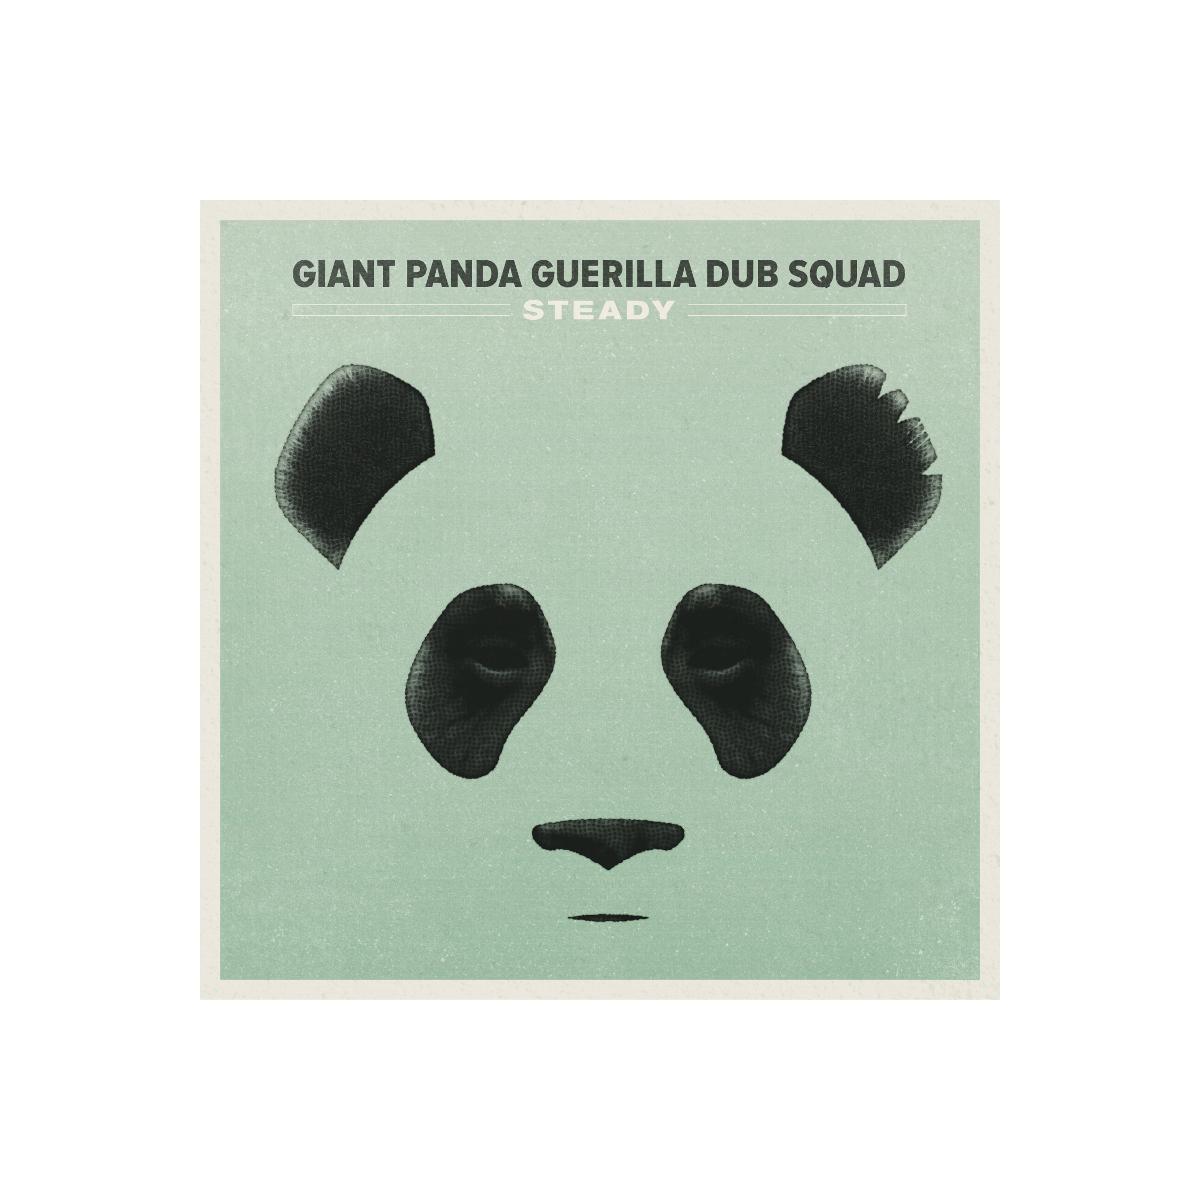 Giant Panda Guerilla Dub Squad - Steady Digital Download